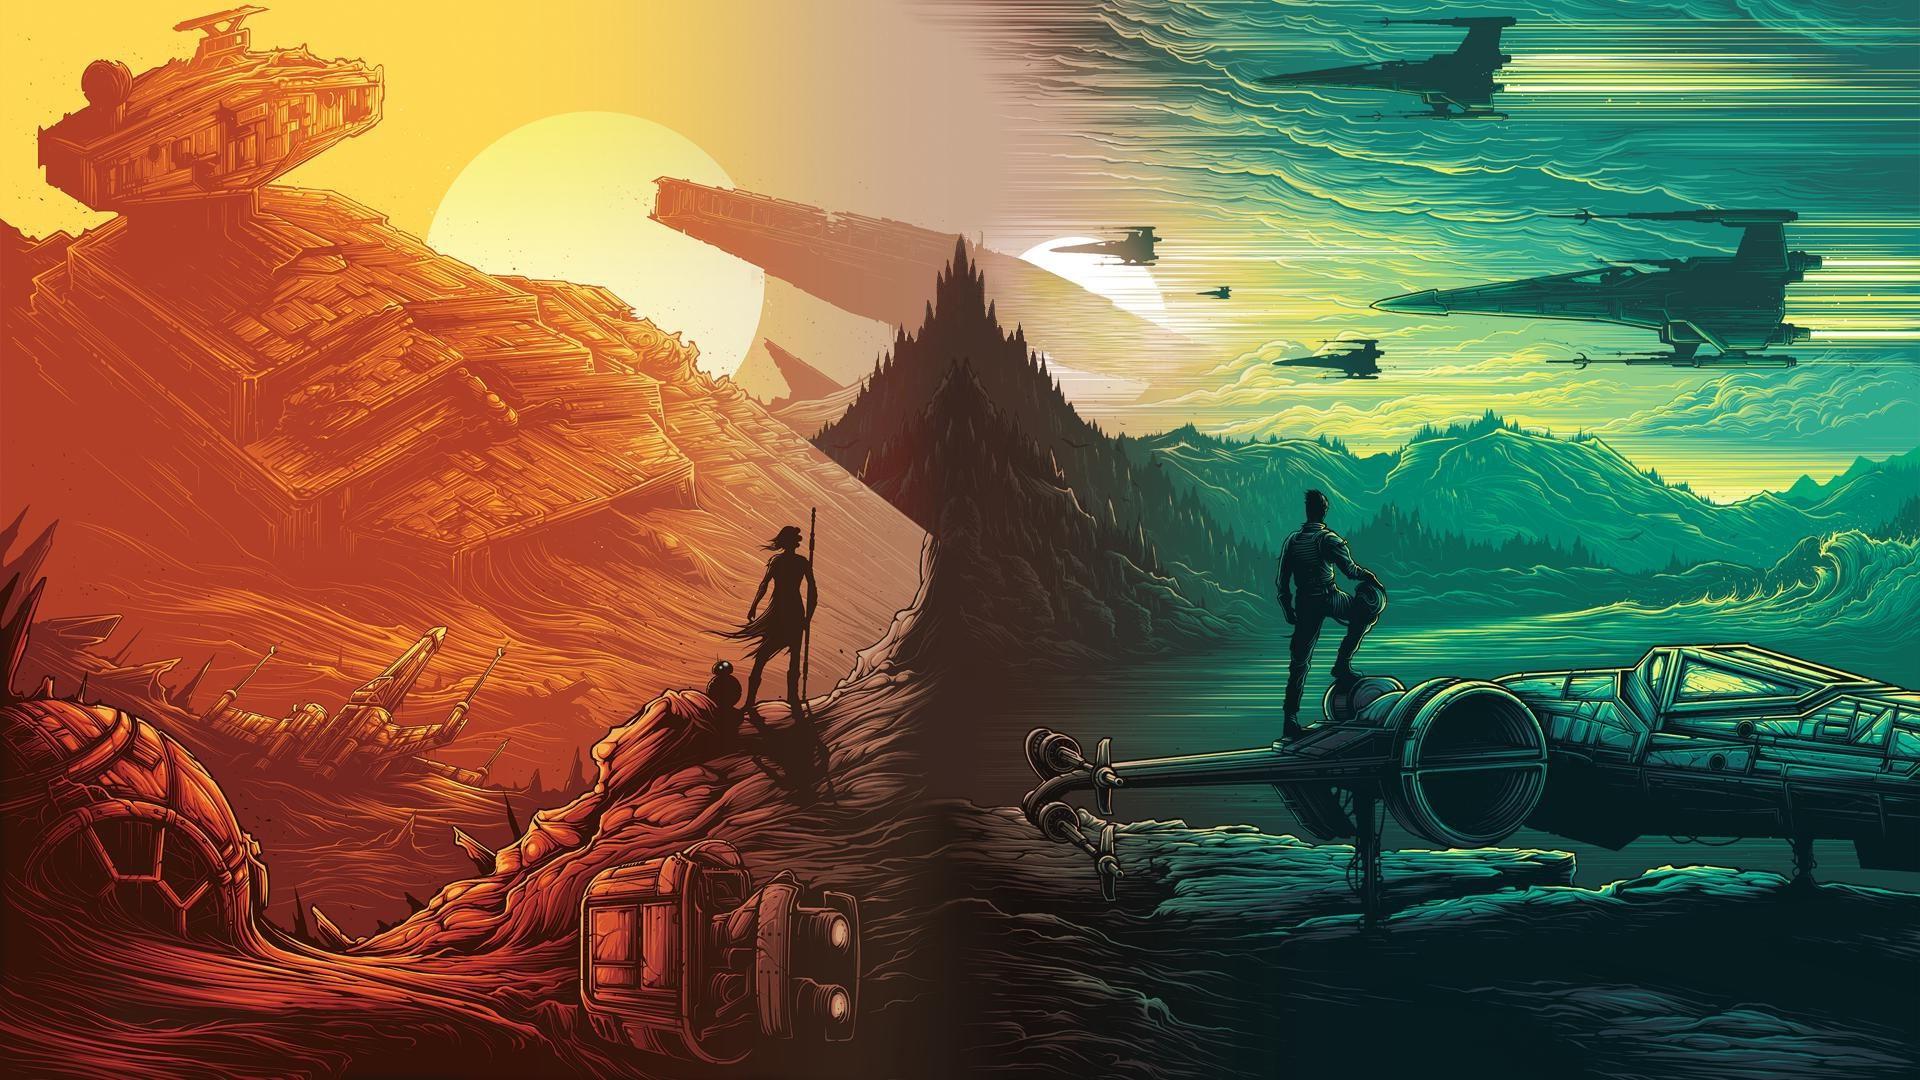 Illustration Star Wars Destroyer X Wing Daisy Ridley Rey Poe Dameron ART Screenshot 1920x1080 Px